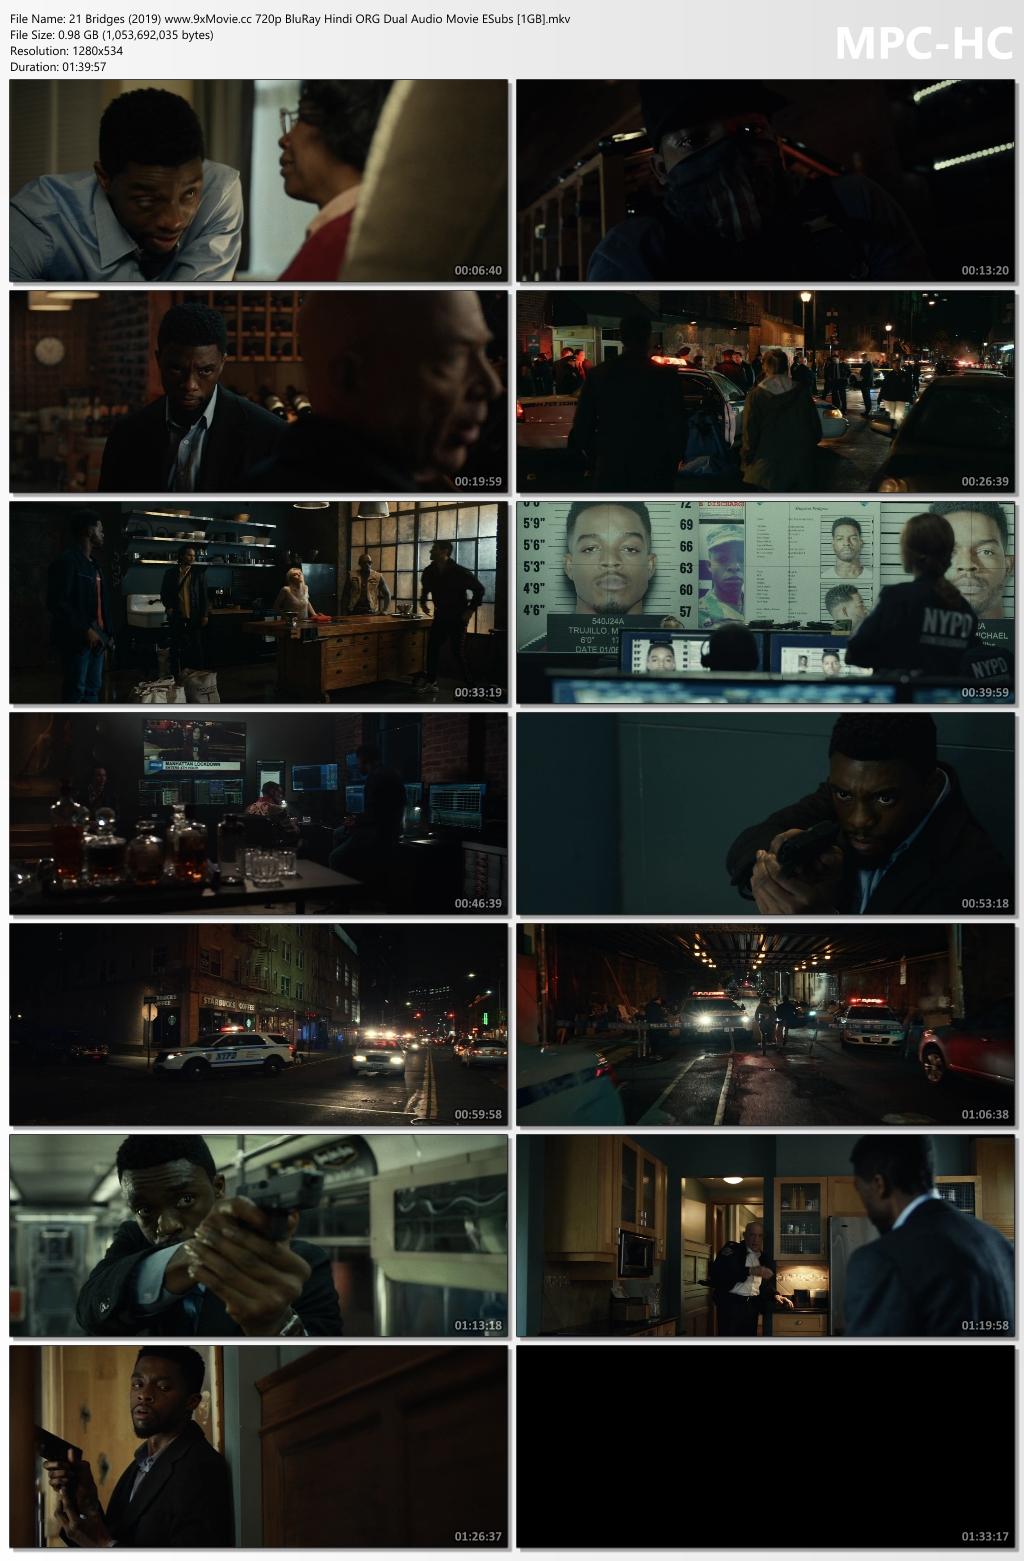 21-Bridges-2019-www-9x-Movie-cc-720p-Blu-Ray-Hindi-ORG-Dual-Audio-Movie-ESubs-1-GB-mkv